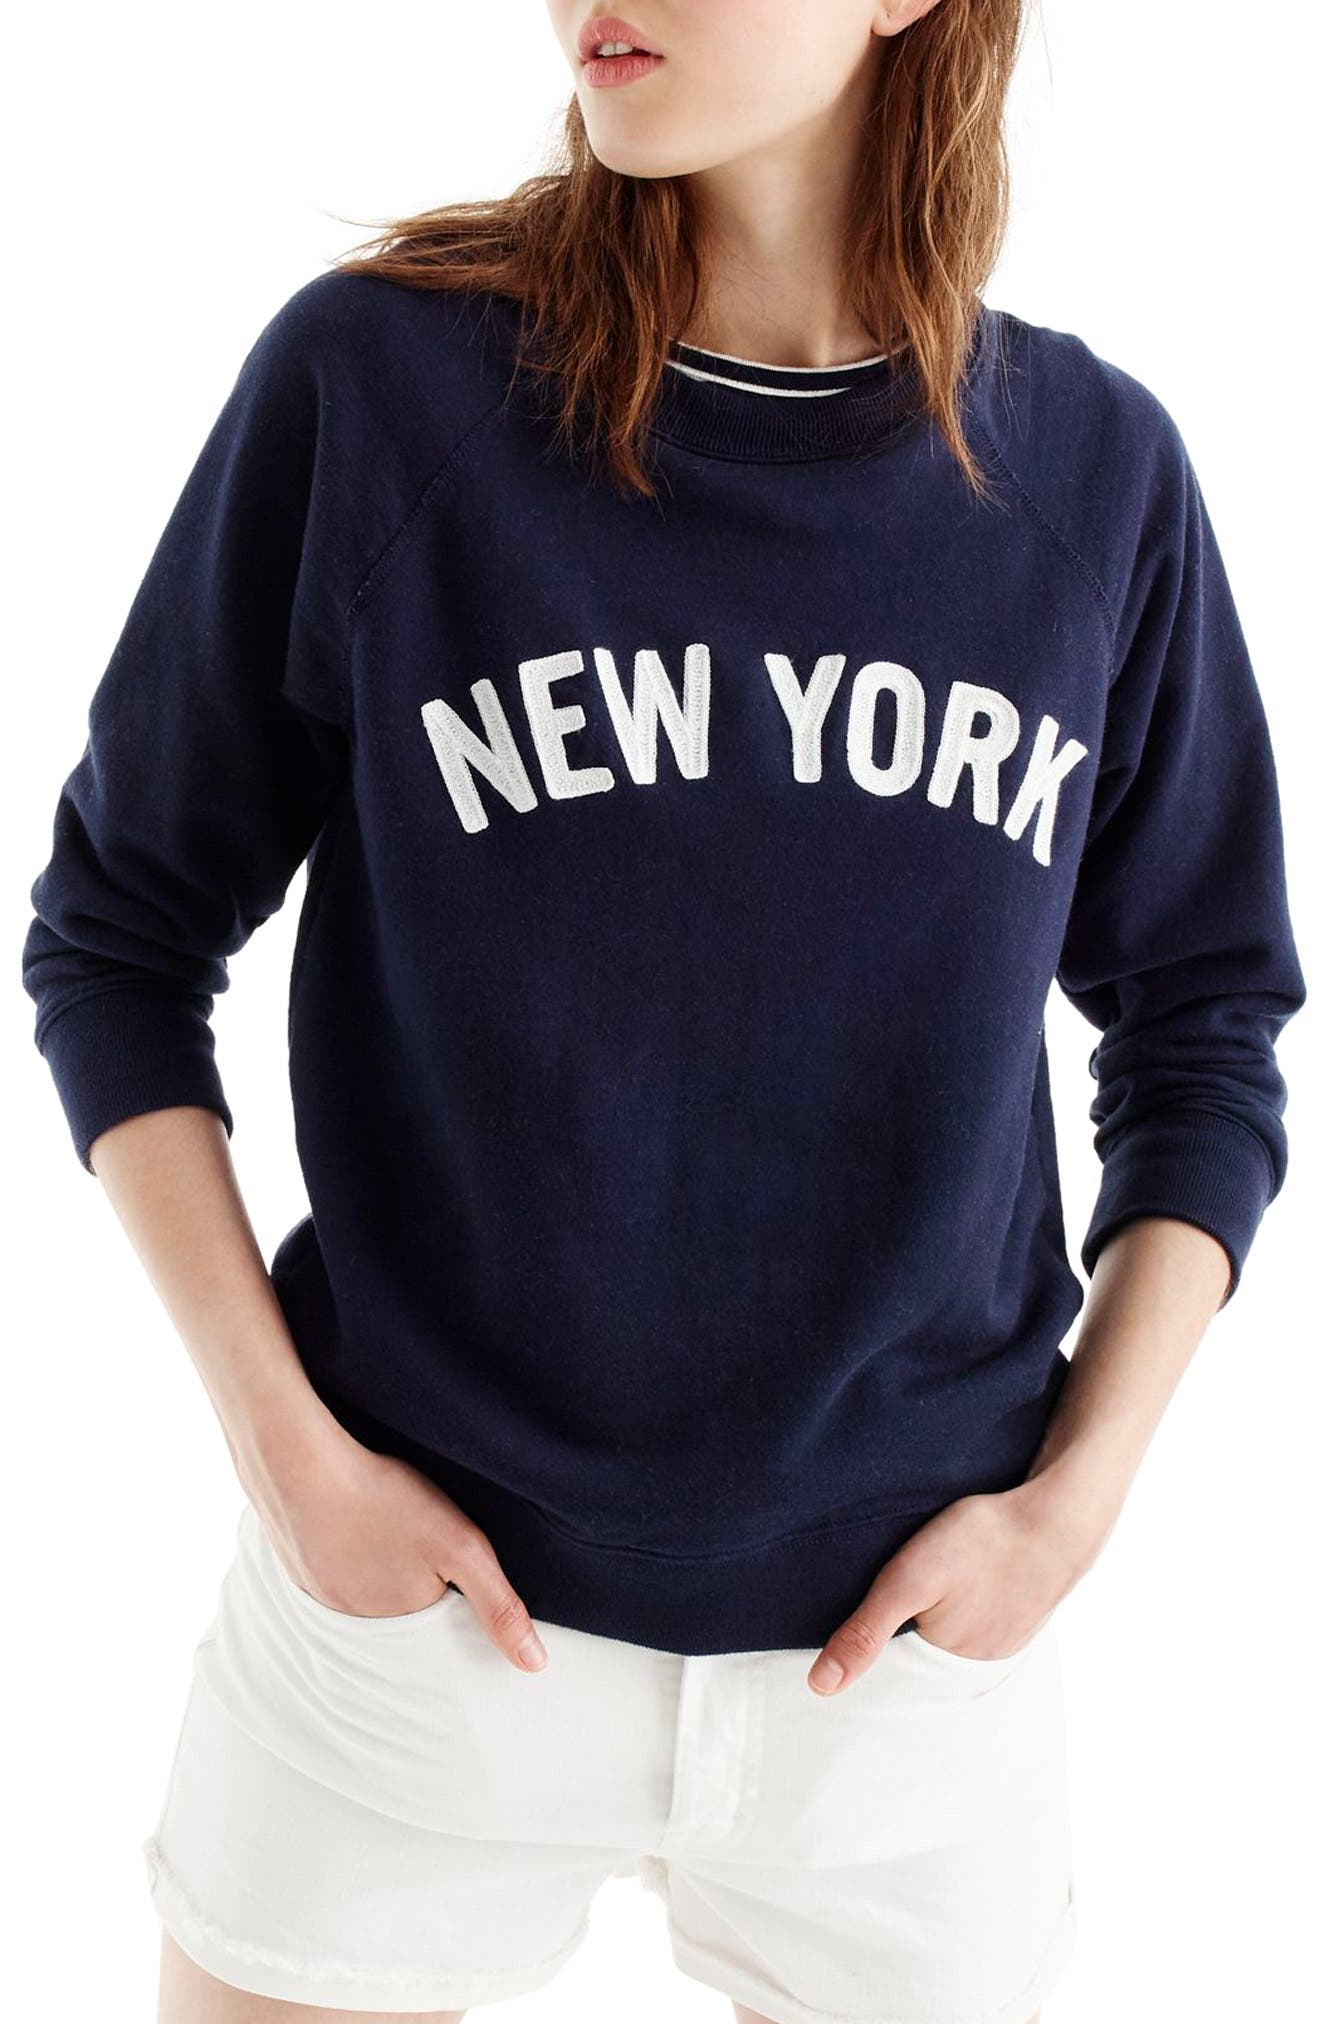 New York Sweatshirt,                         Main,                         color, 400